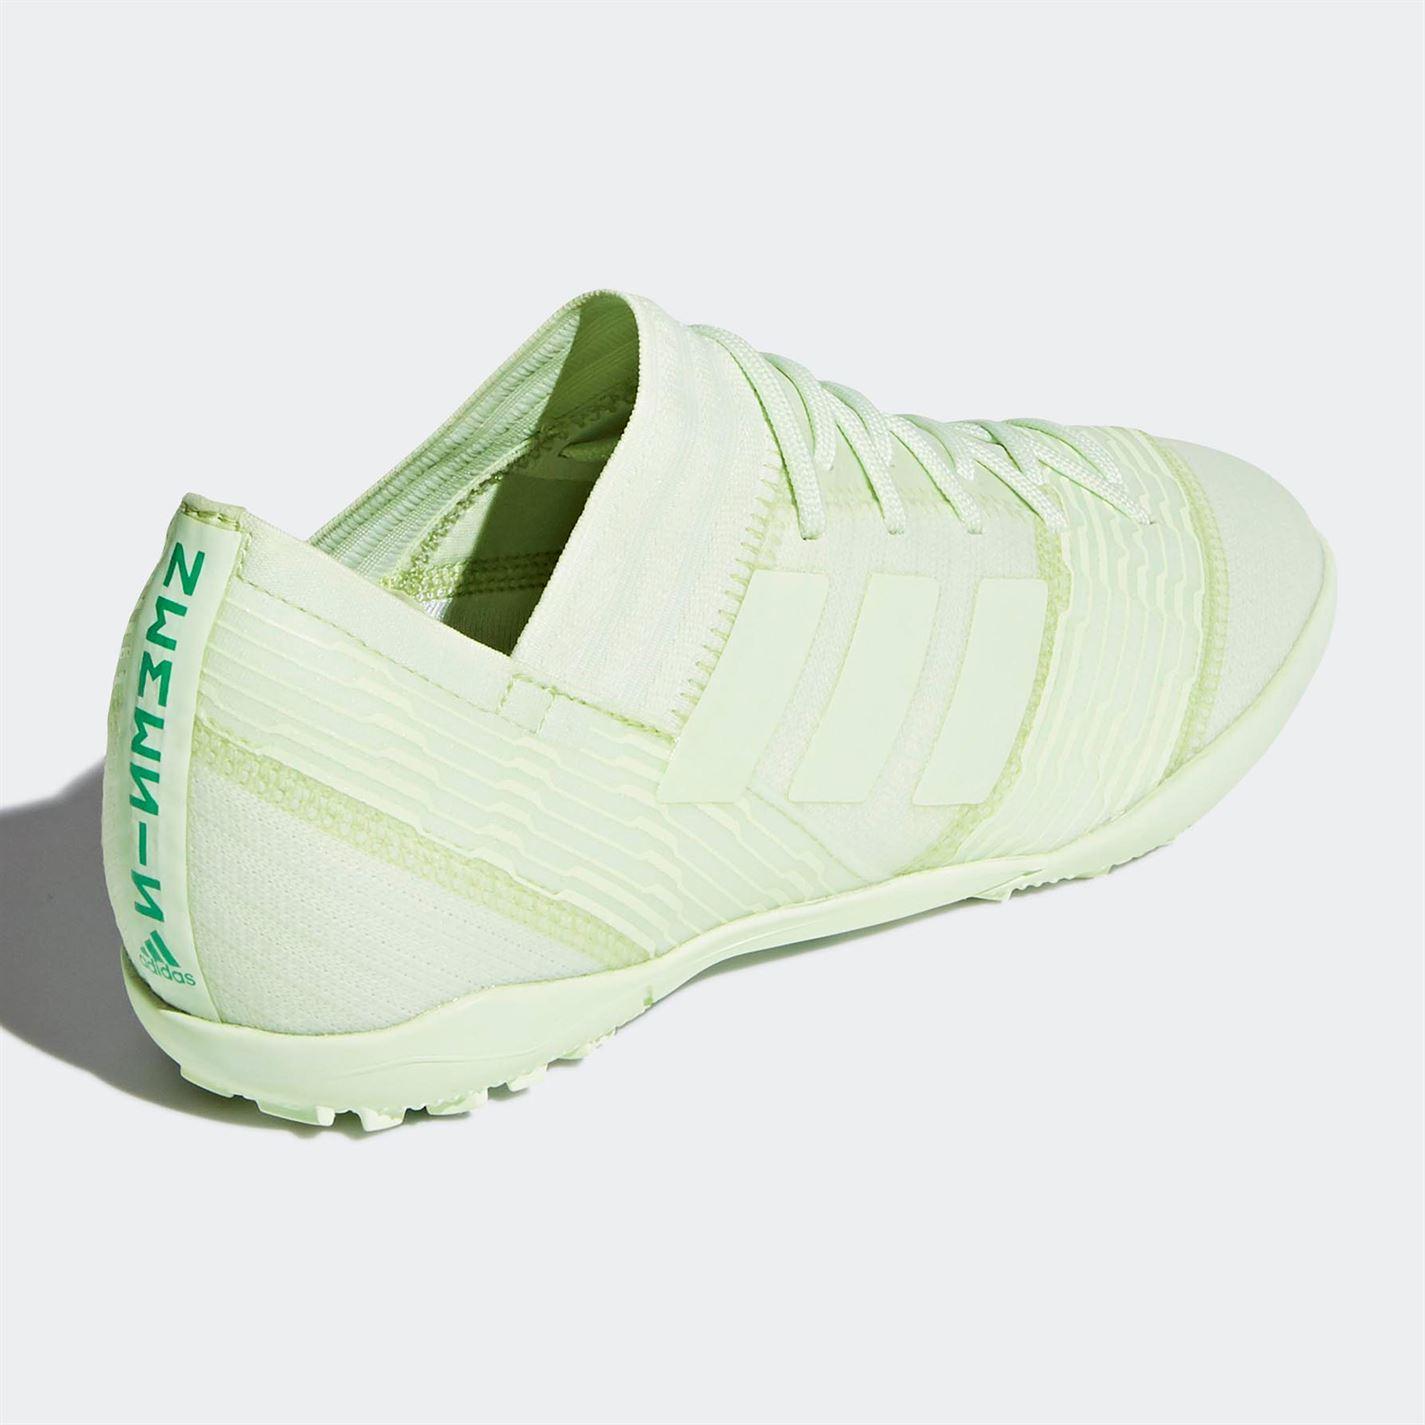 Shoes Childs Astro Tango Football 17.3 Astro Nemeziz adidas